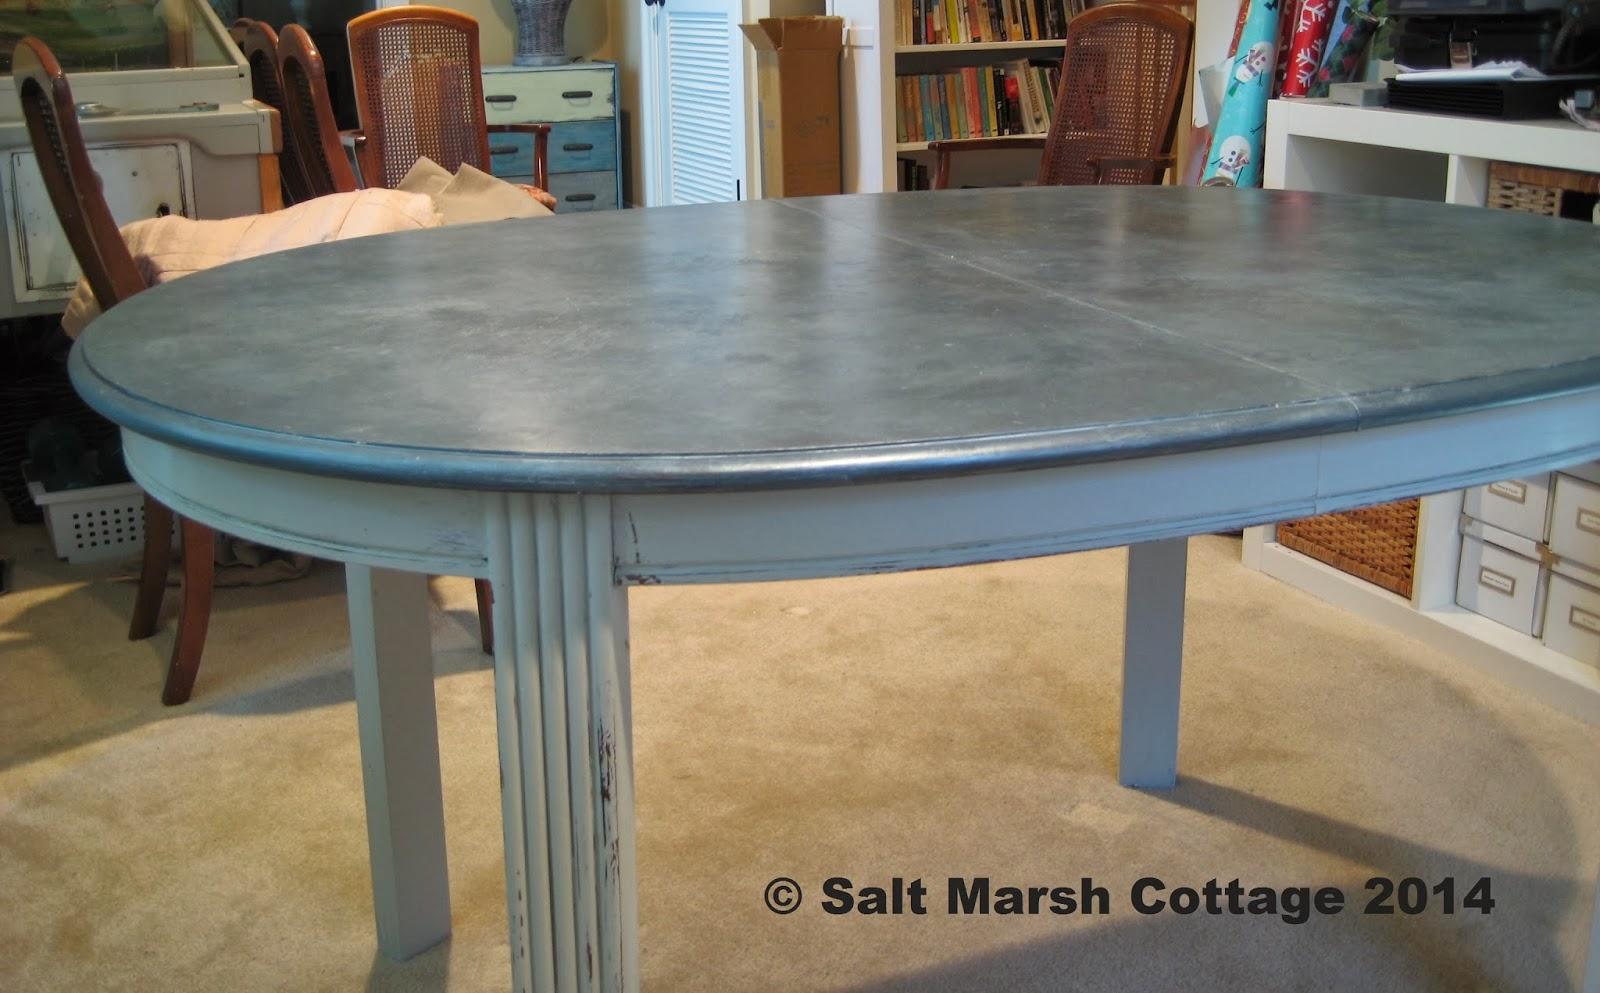 Salt Marsh Cottage Ballard Messina Table Knock Off Revealed : IMG1325 from saltmarshcottage.blogspot.com size 1600 x 993 jpeg 214kB